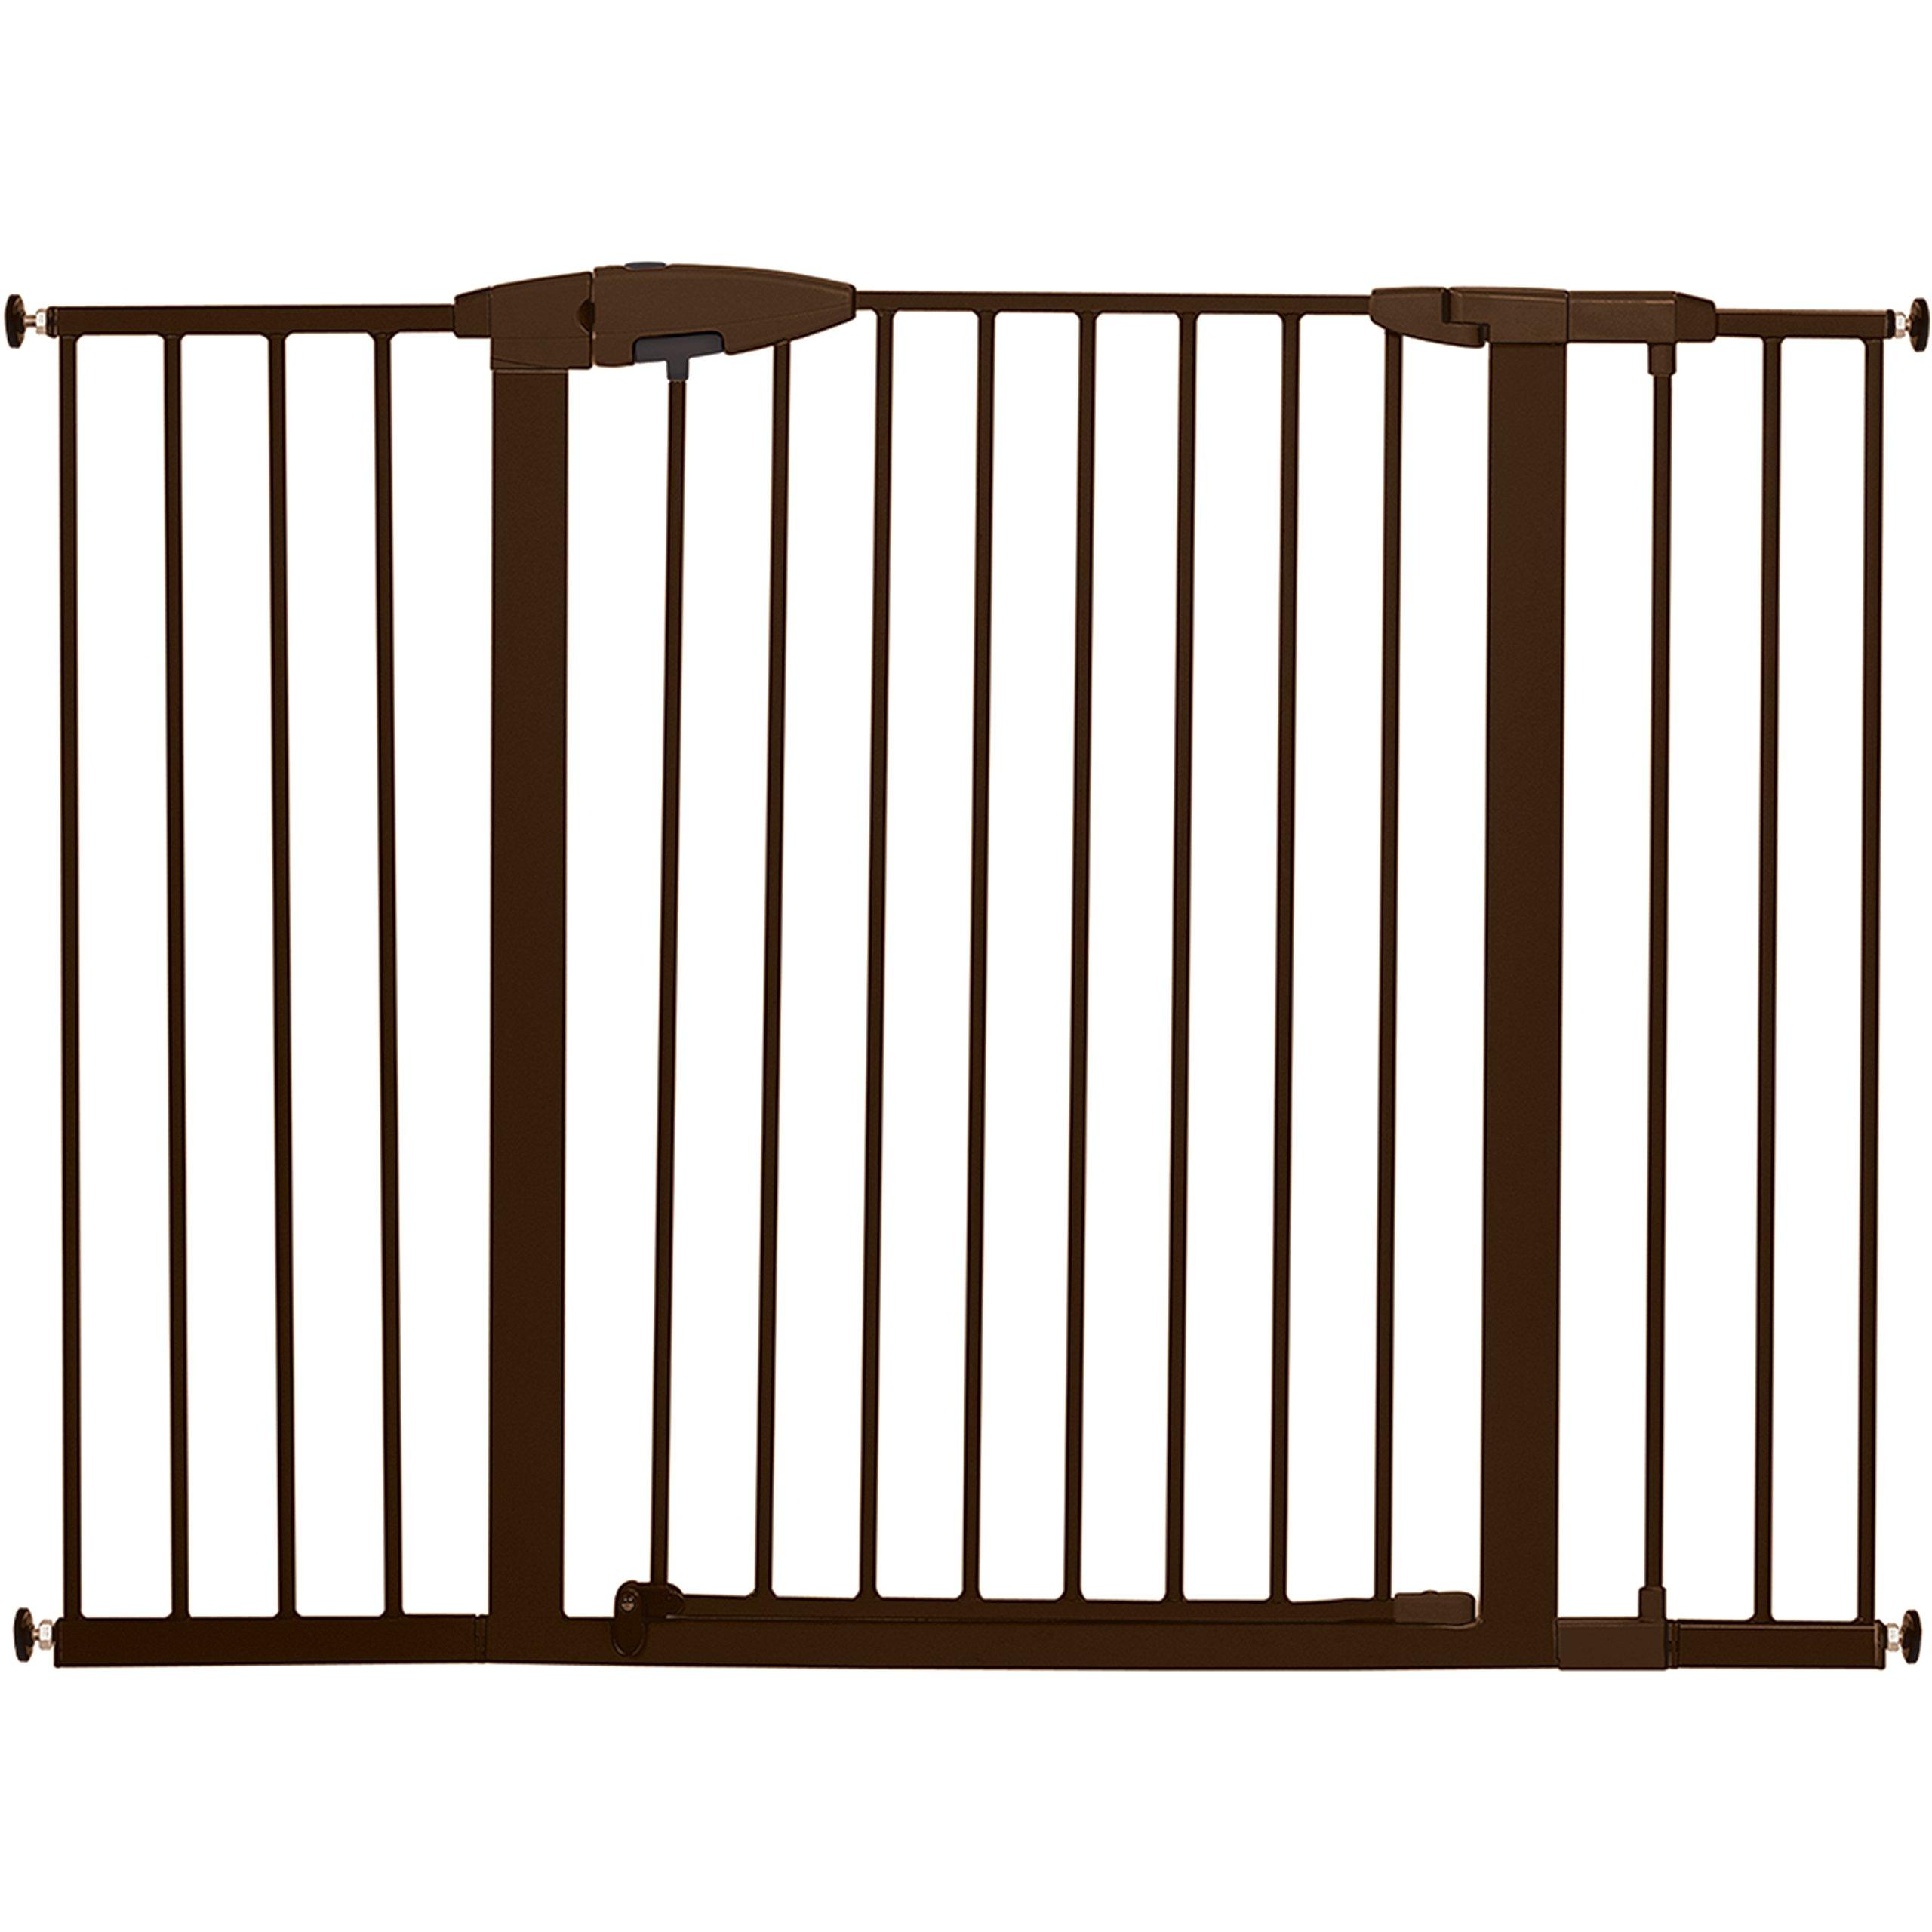 Munchkin Easy Close XL Metal Baby Gate, 29.5'' - 51.6'' Wide, Bronze, Model MK0009-111 by Munchkin